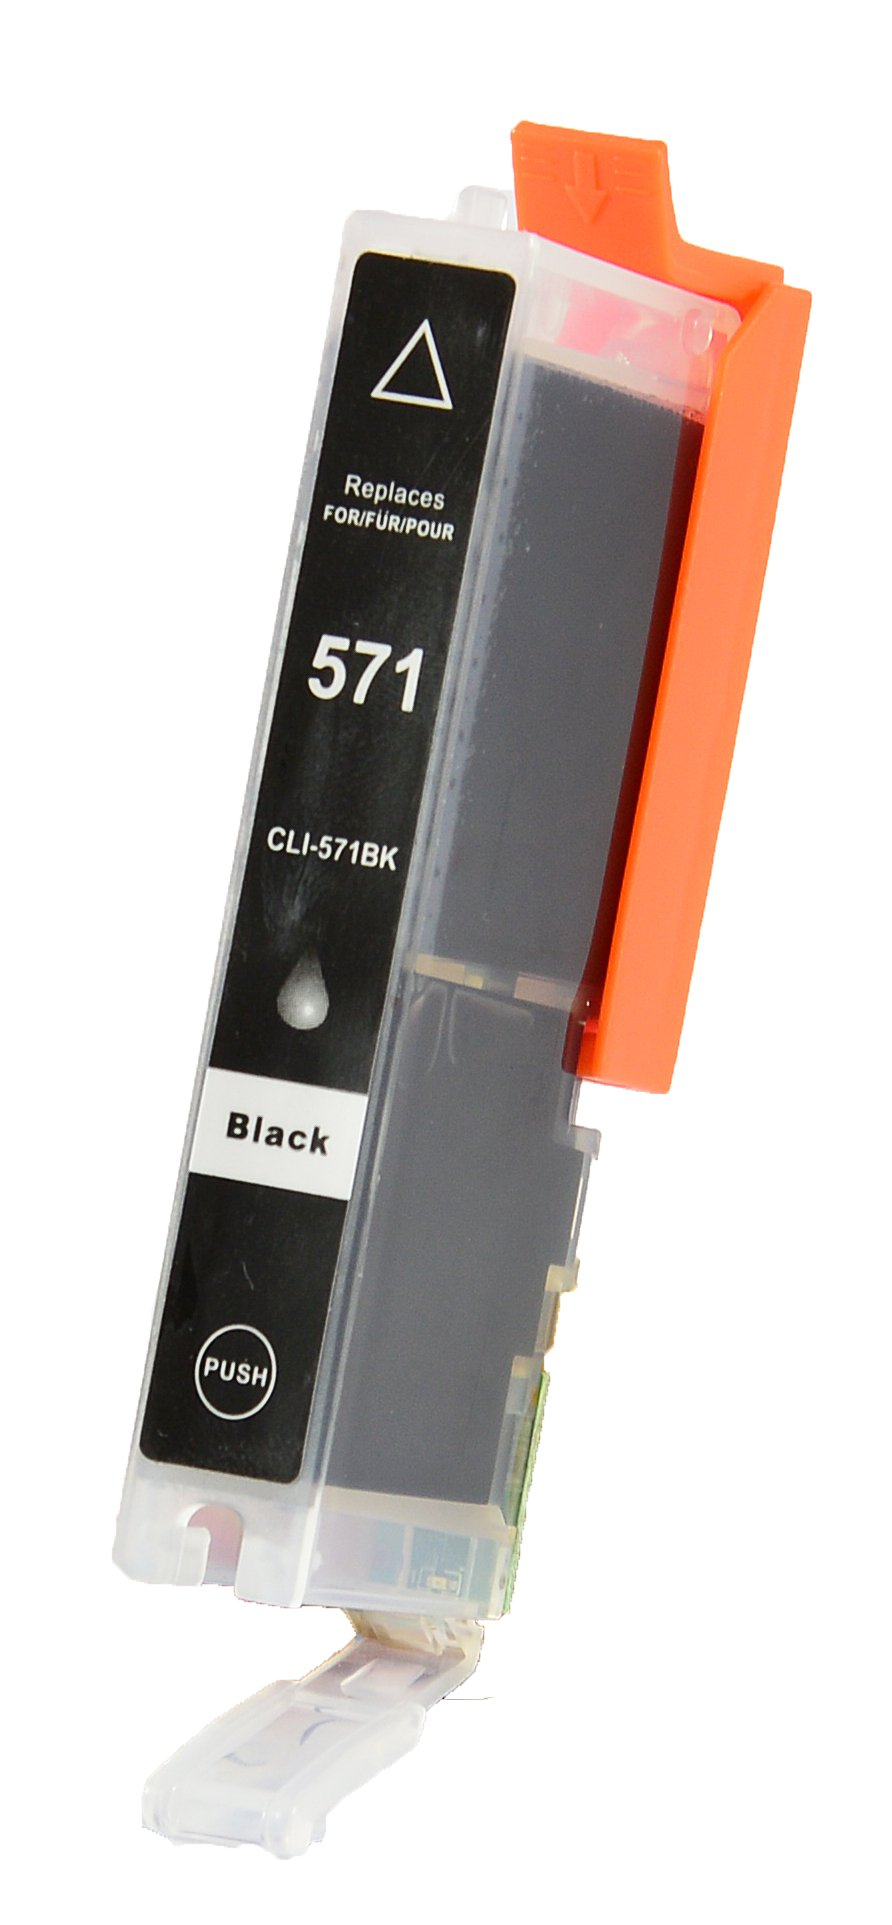 Bubprint-Druckerpatrone-kompatibel-fr-Canon-CLI-571XL-CLI-571XL-fr-Pixma-MG5750-MG5751-MG7750-TS5050-TS5051-TS6050-TS8050-TS8051-TS9050-Photoblack